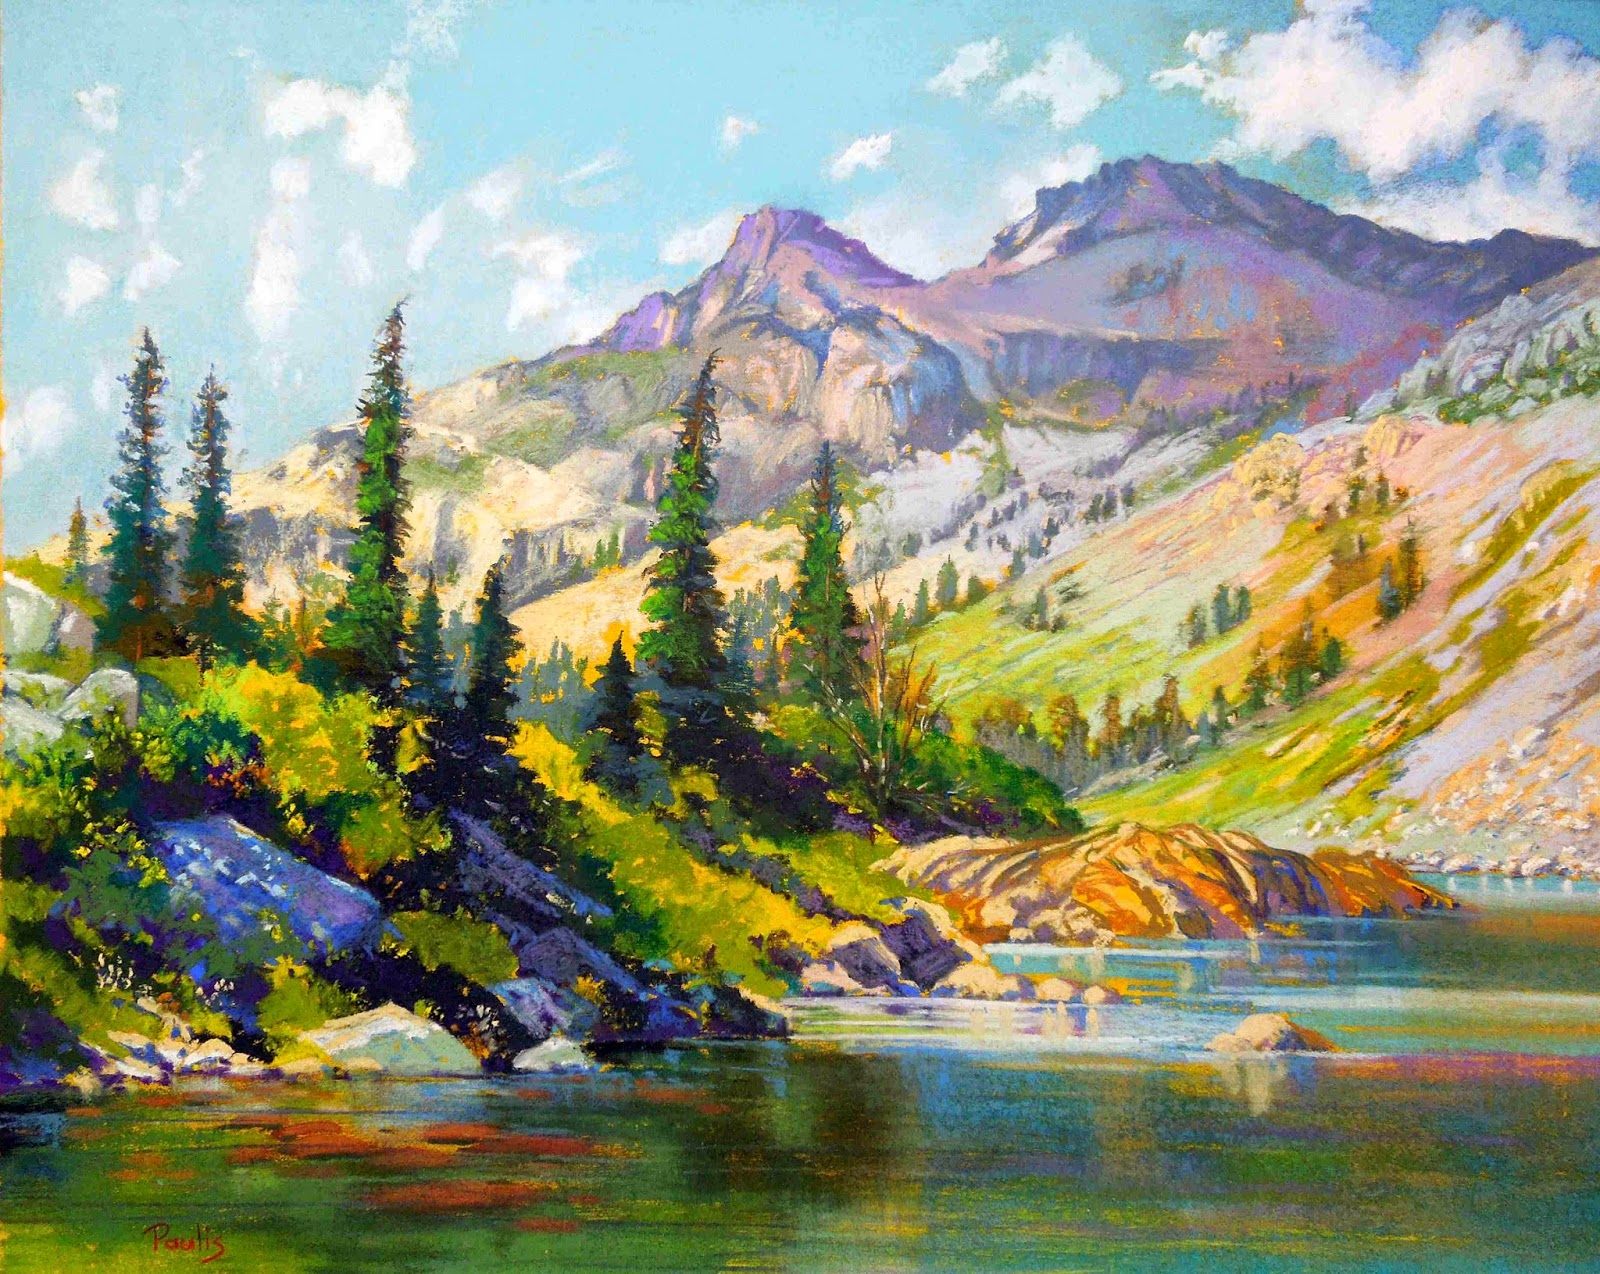 Bonita paulis fine art 16 x 20 pastel paintings for Summer lake